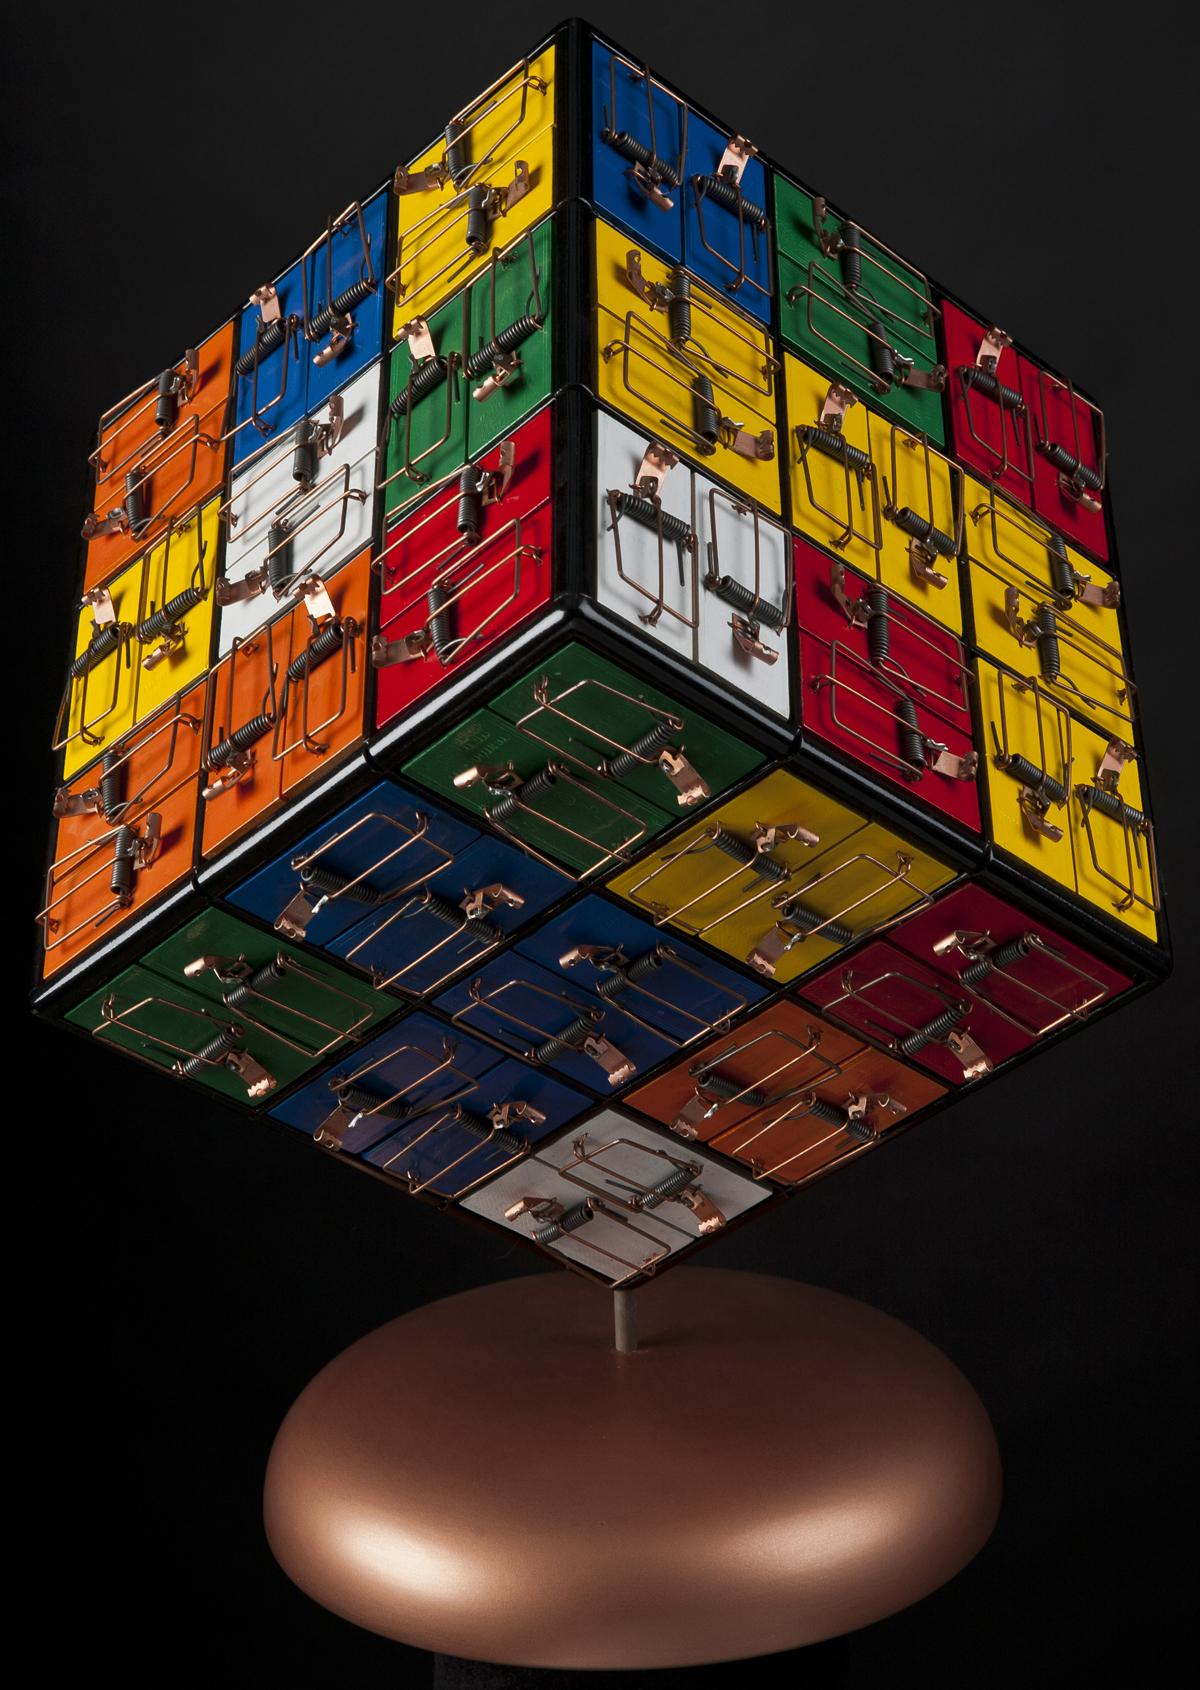 Rubik's Cube, 2012, 16 x 13 x 13 (Sold)